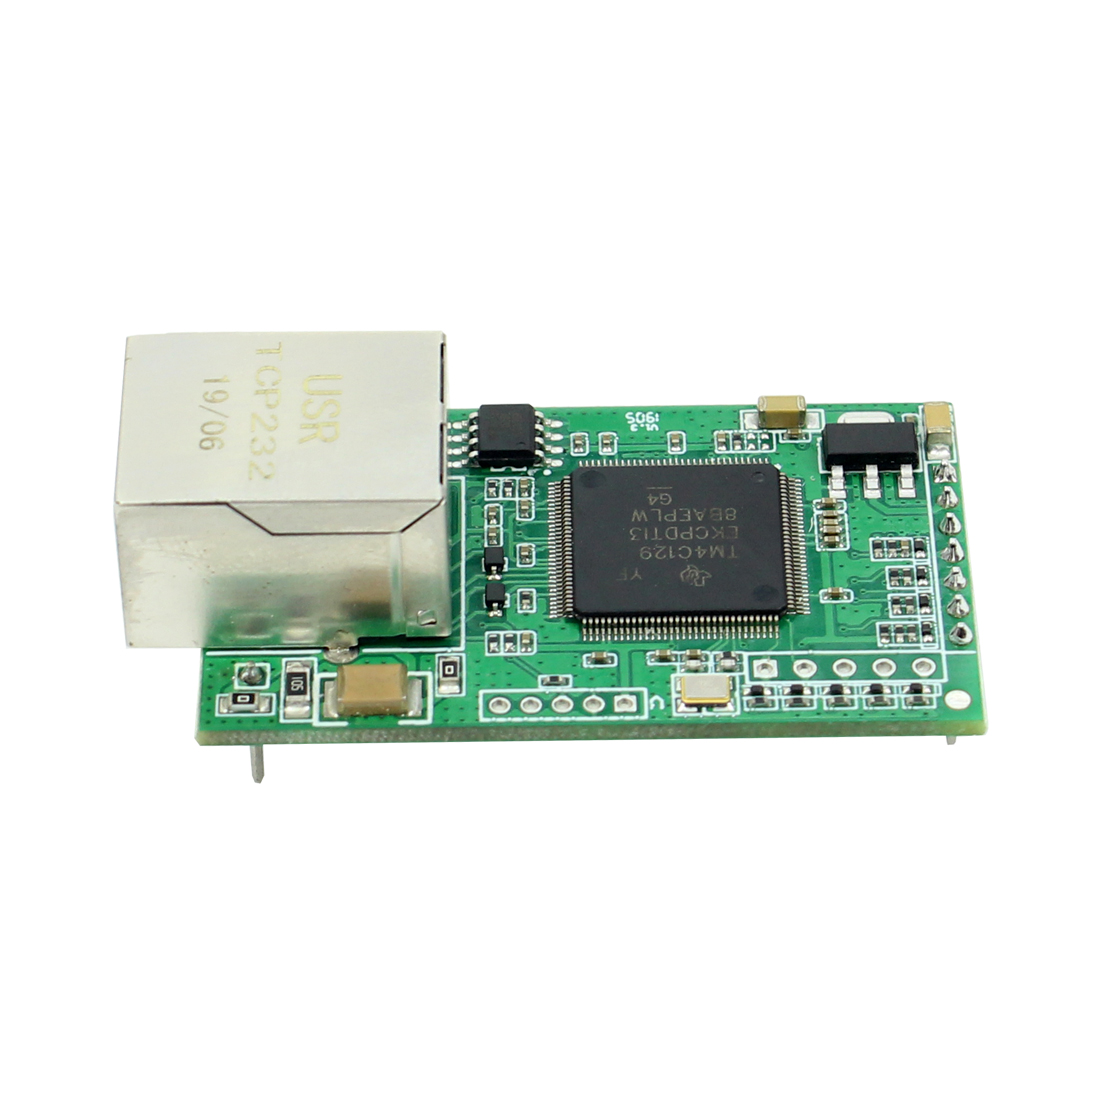 1 piece USR-TCP232-E2 Pin Type Serial UART TTL to LAN Ethernet Module 2 serial ports 4